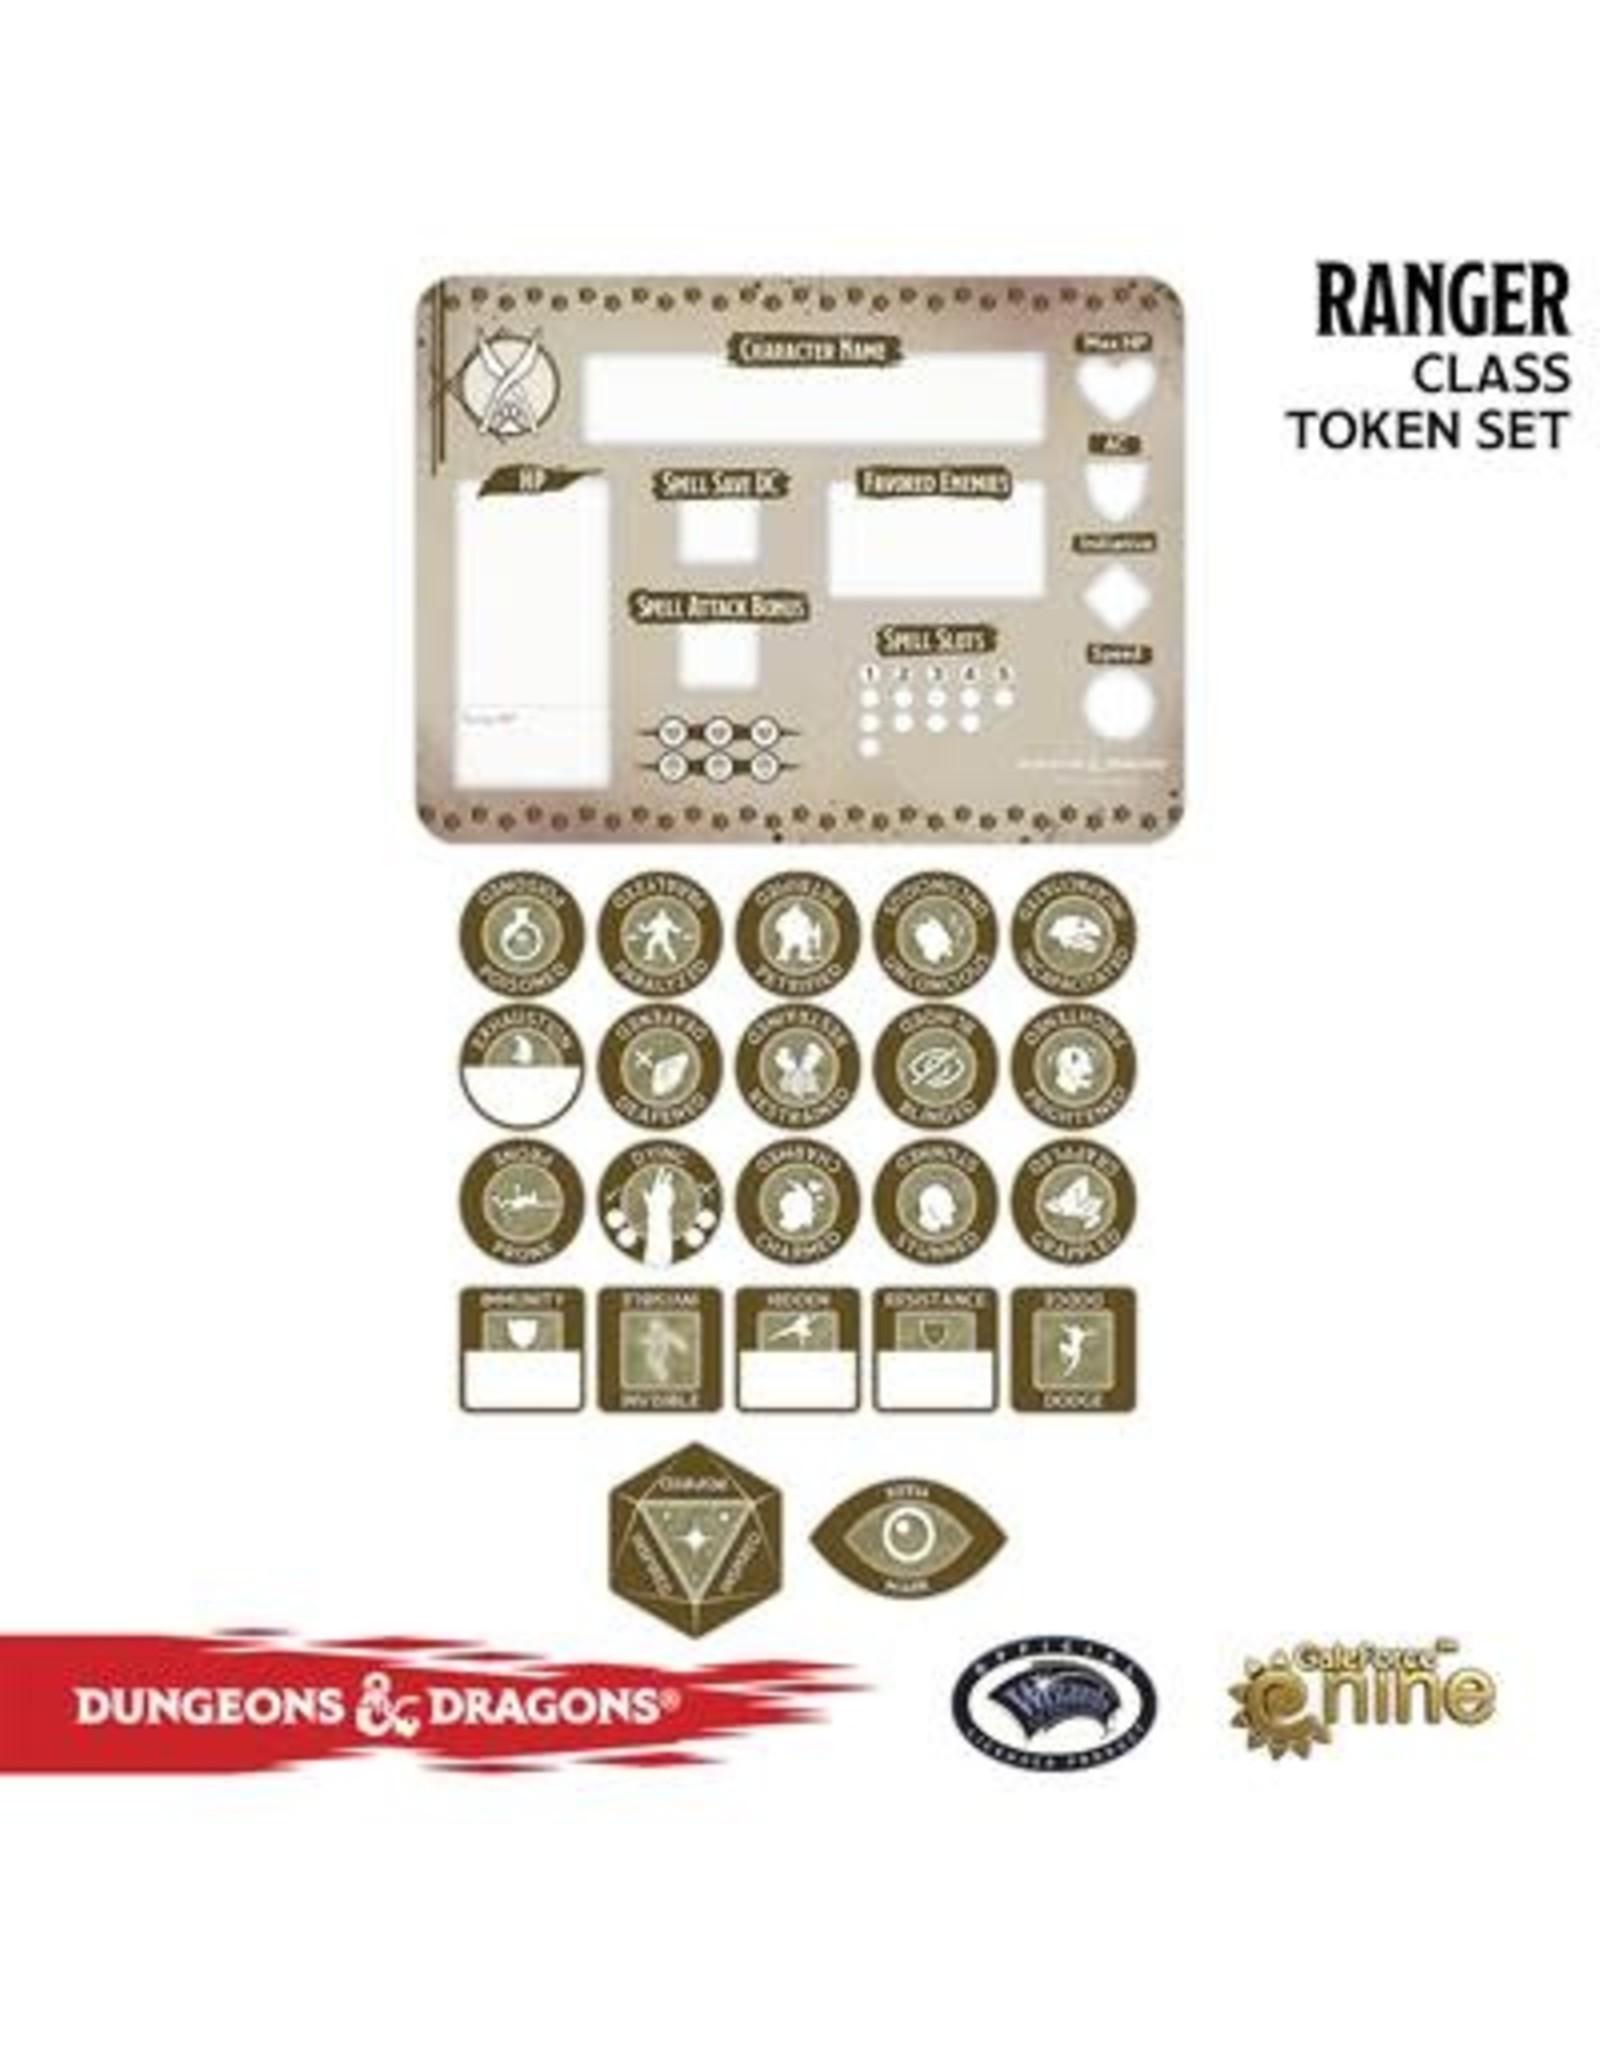 GaleForce nine D&D 5E: Player Token Set - Ranger